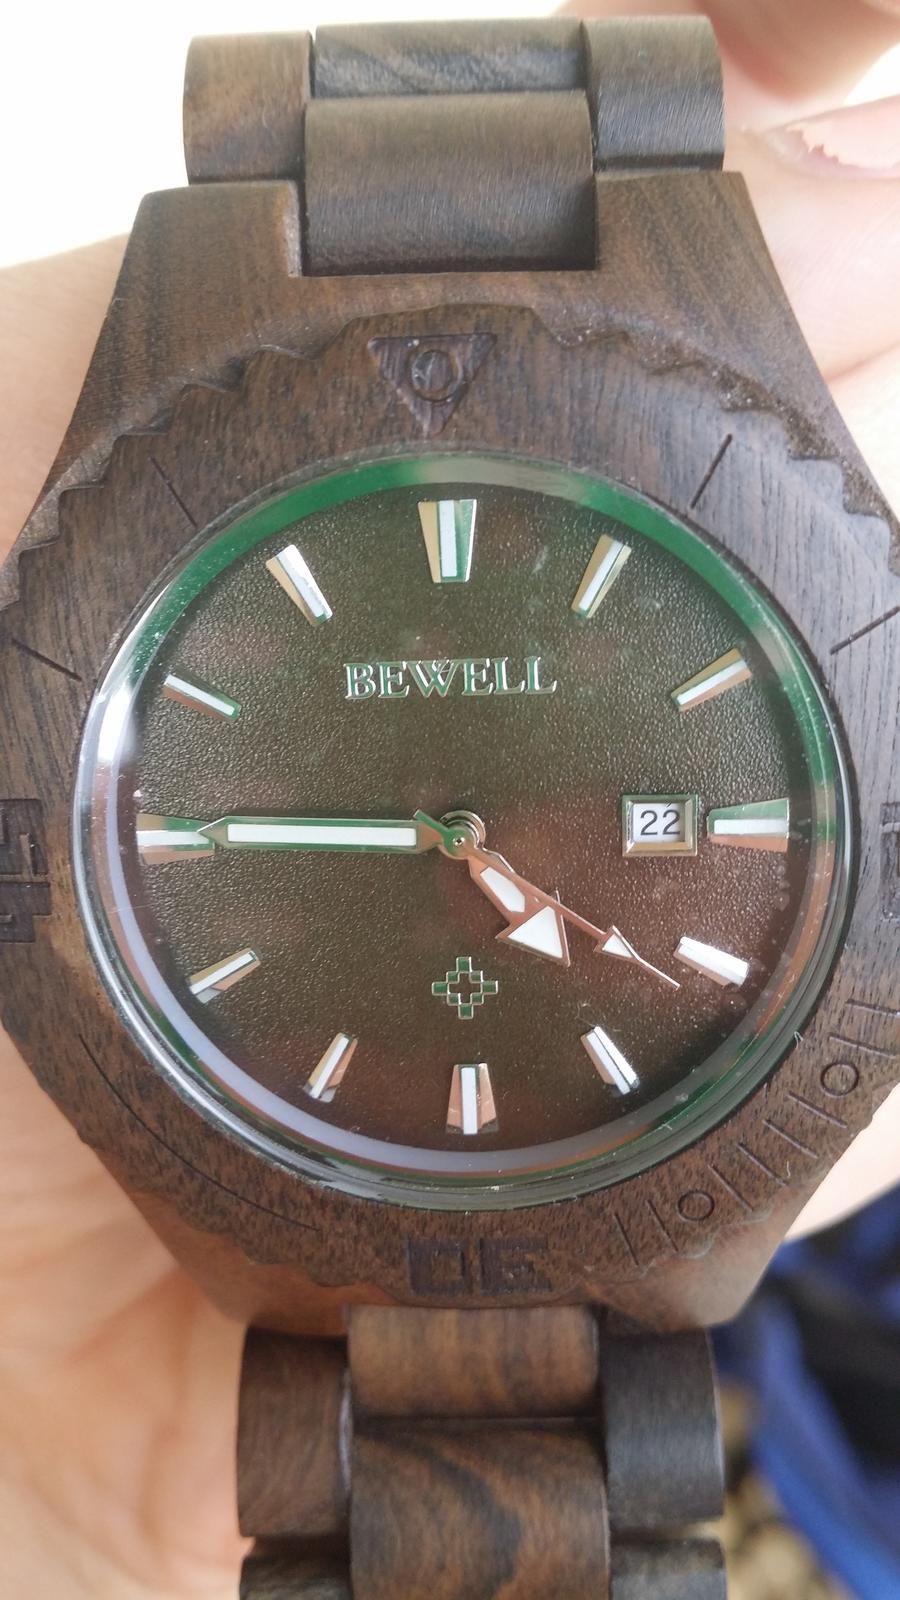 Drevene hodinky zn.rewell a2a288c18b3